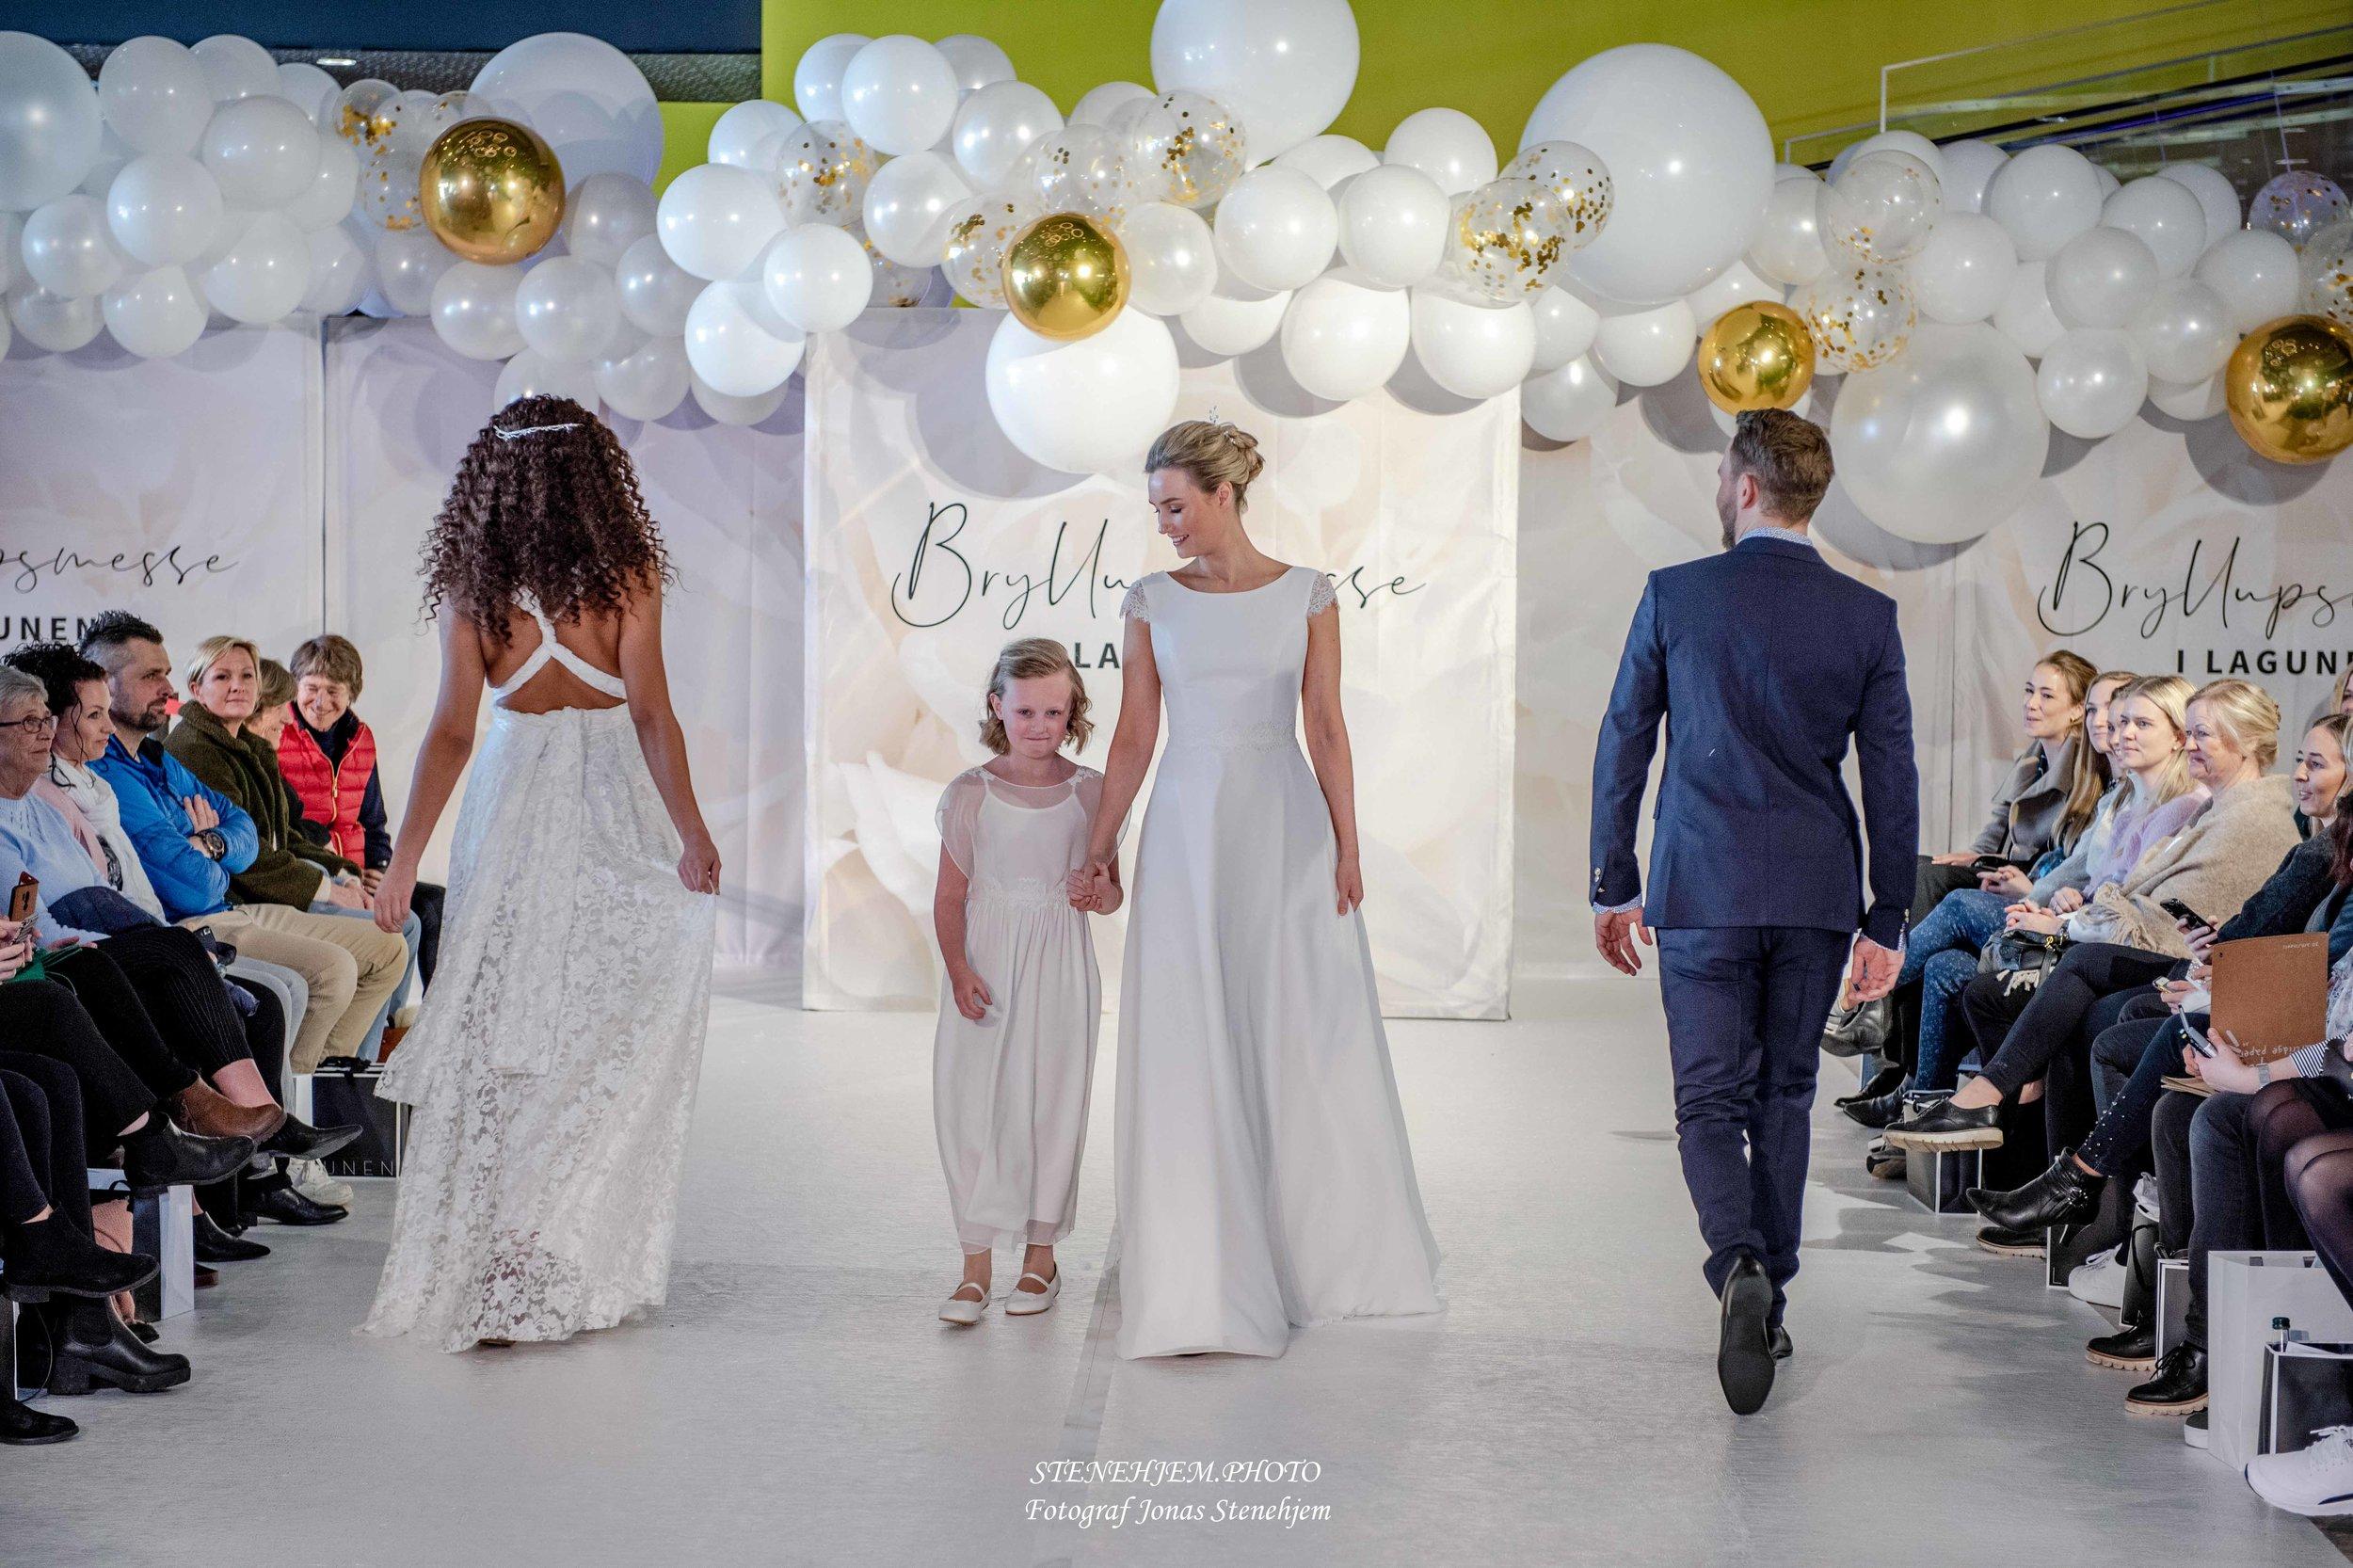 Bryllupsmesse_Lagunen_mittaltweddingfair__046.jpg